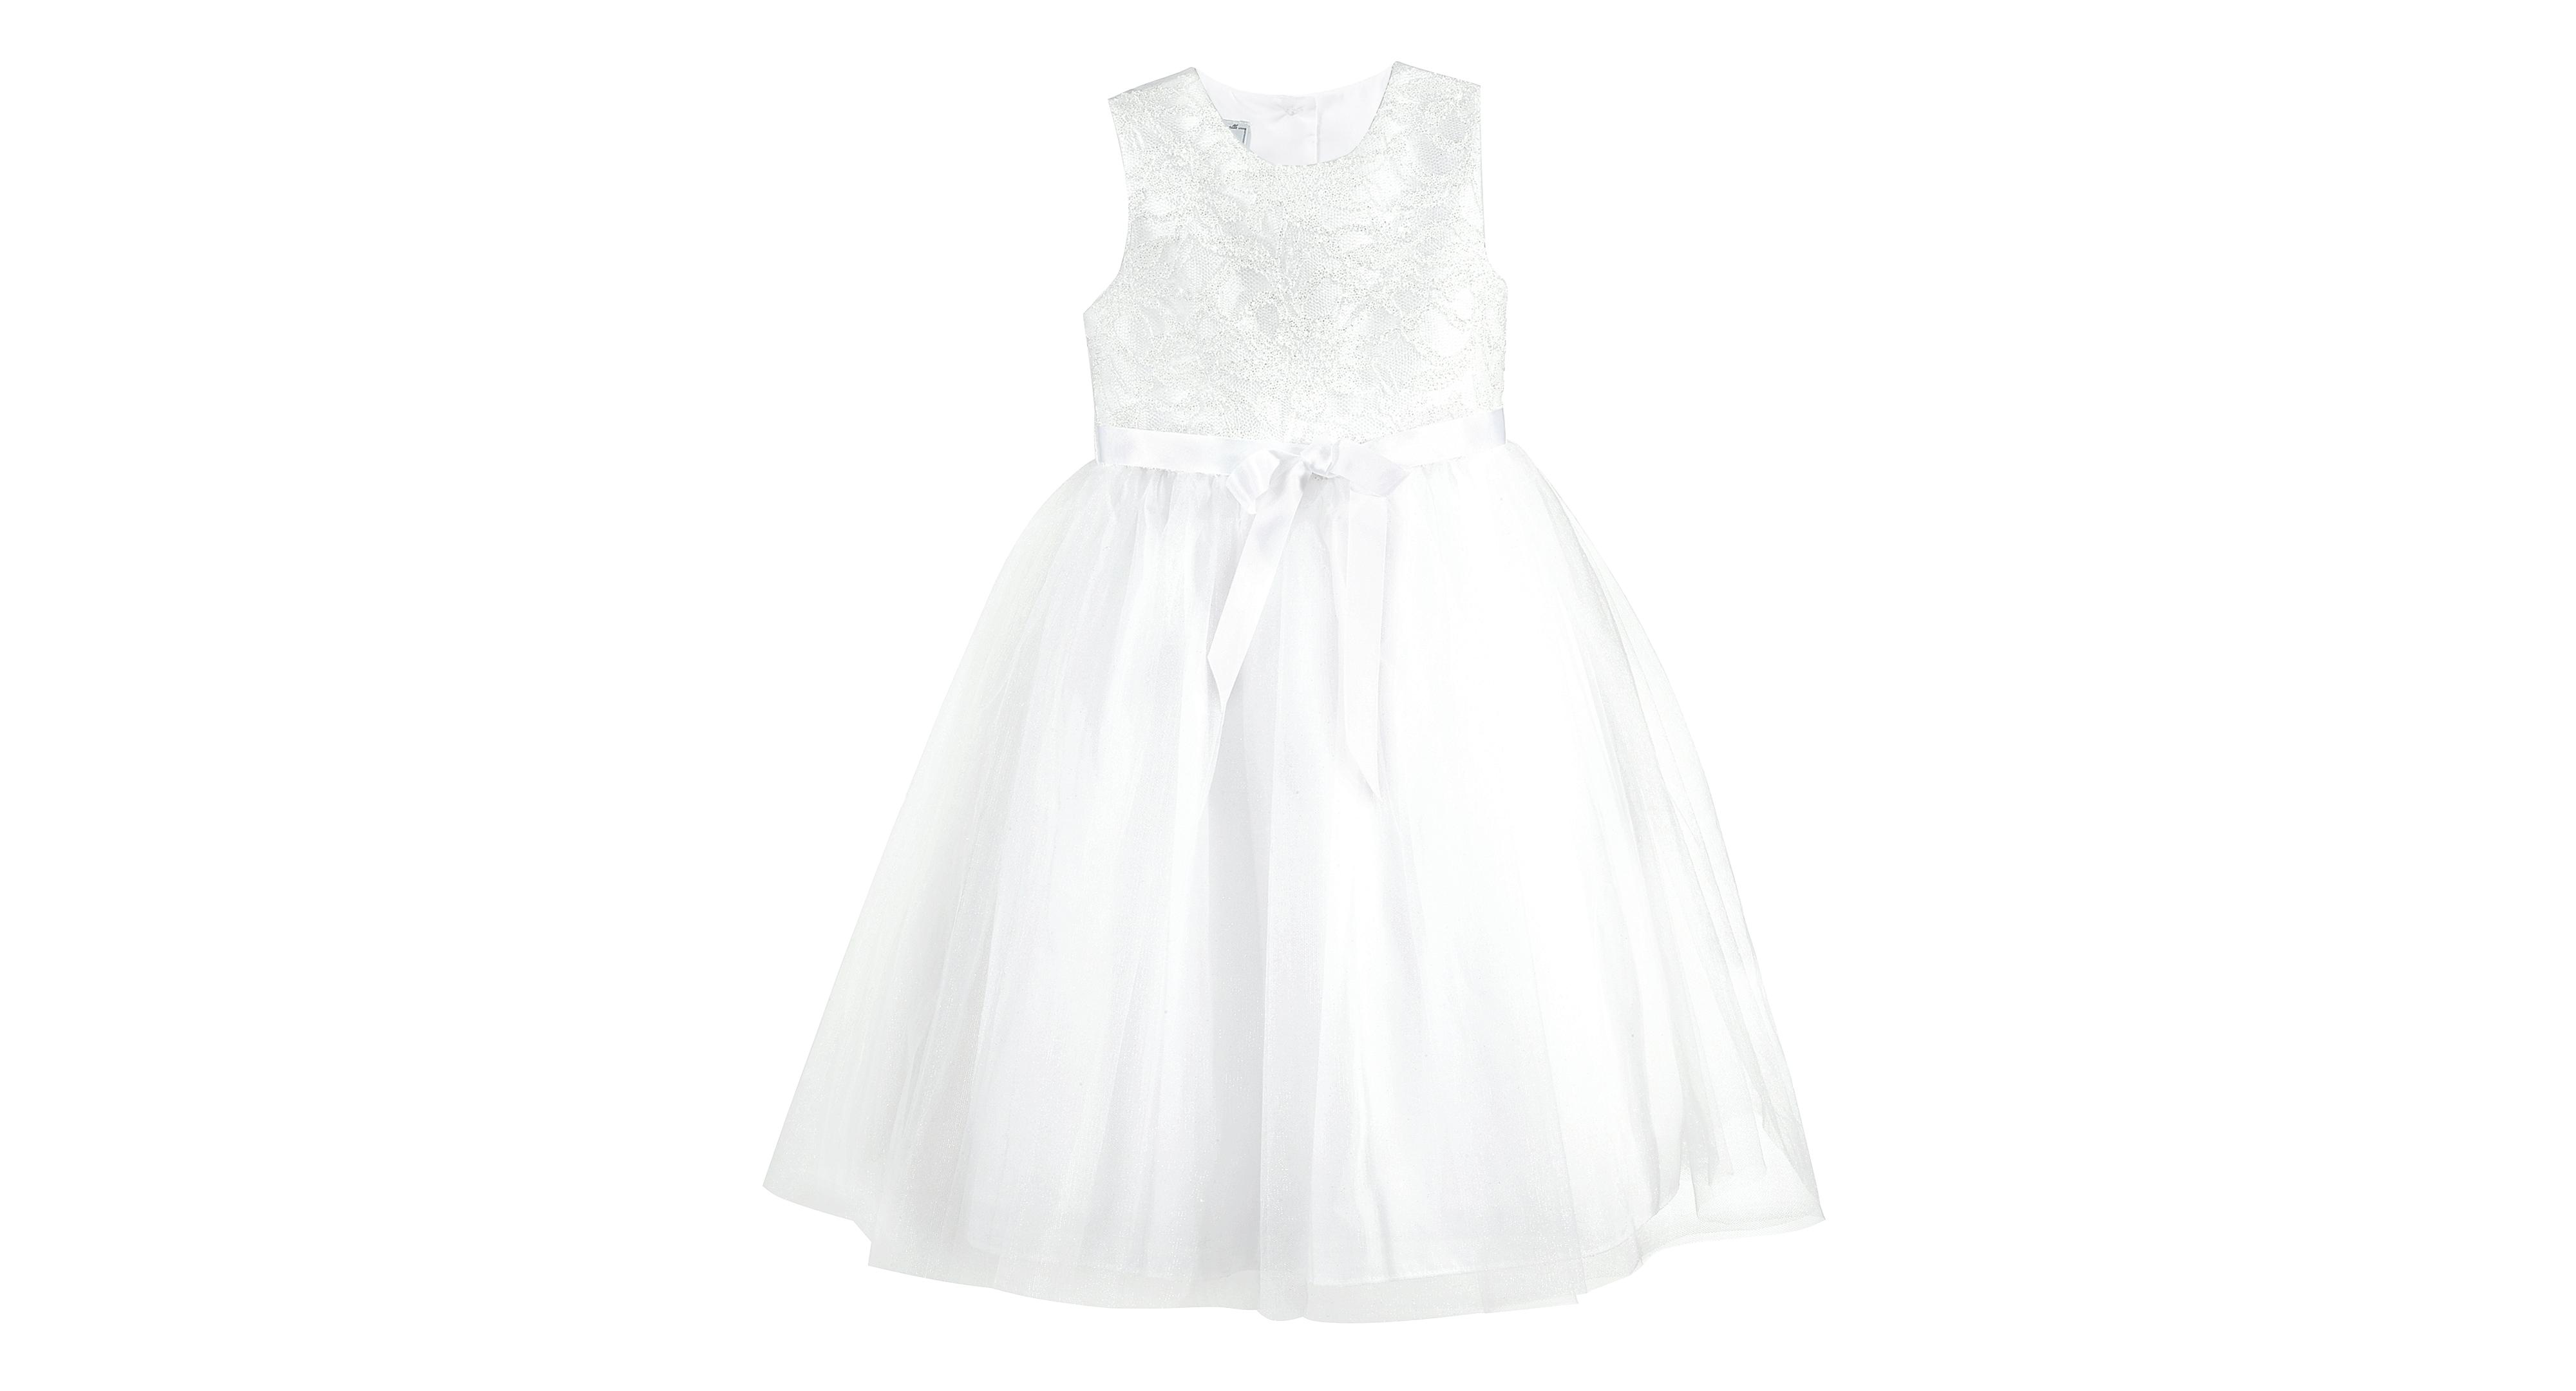 Marmellata Girls Glitter Lace Ballerina Flower Girl Dress